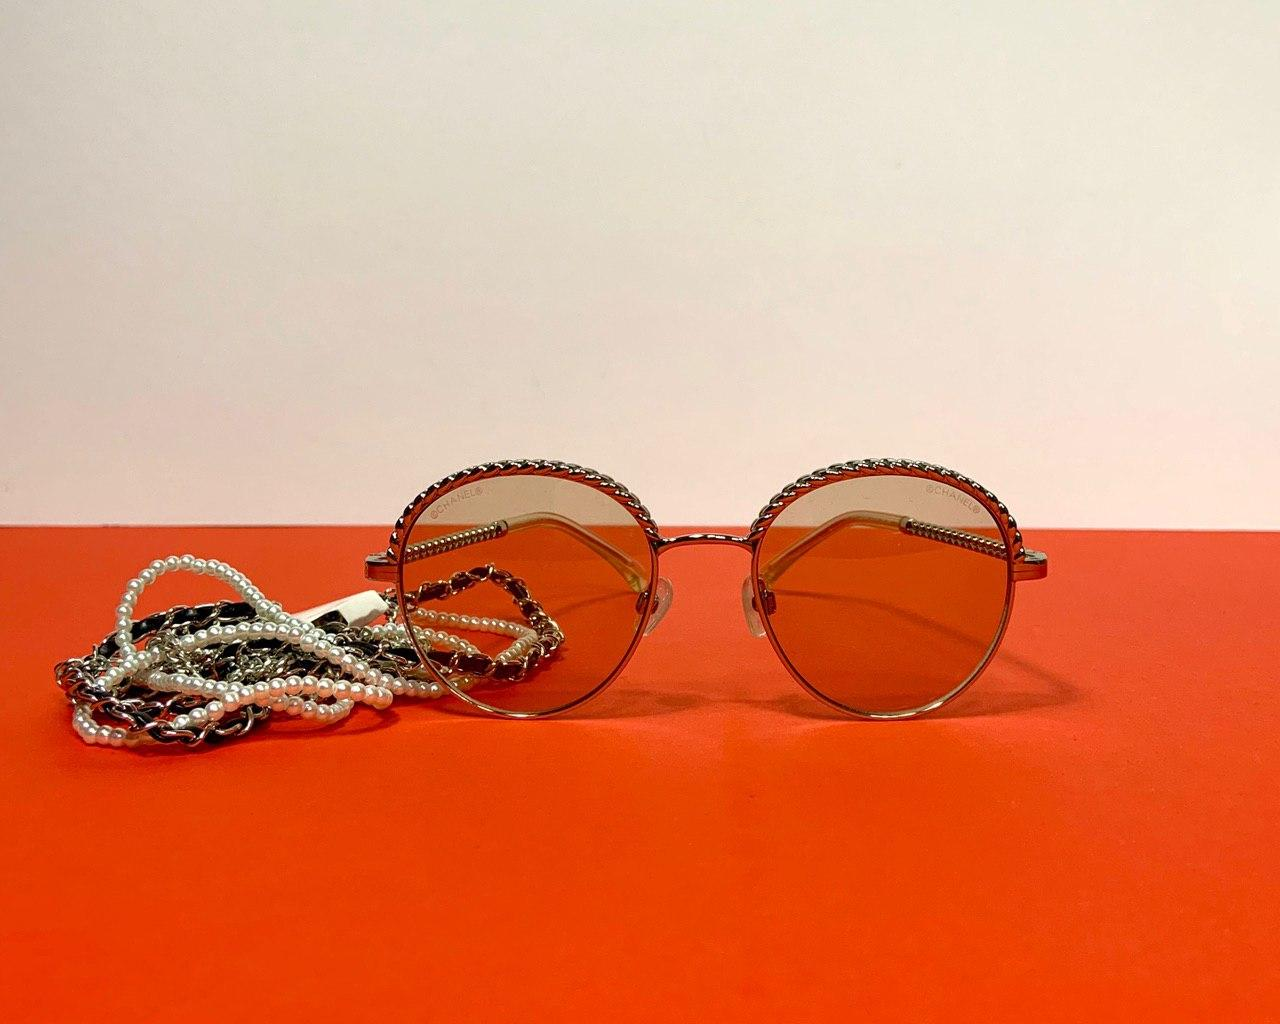 Женские очки C*anel (Шан*ль) арт. 106-07